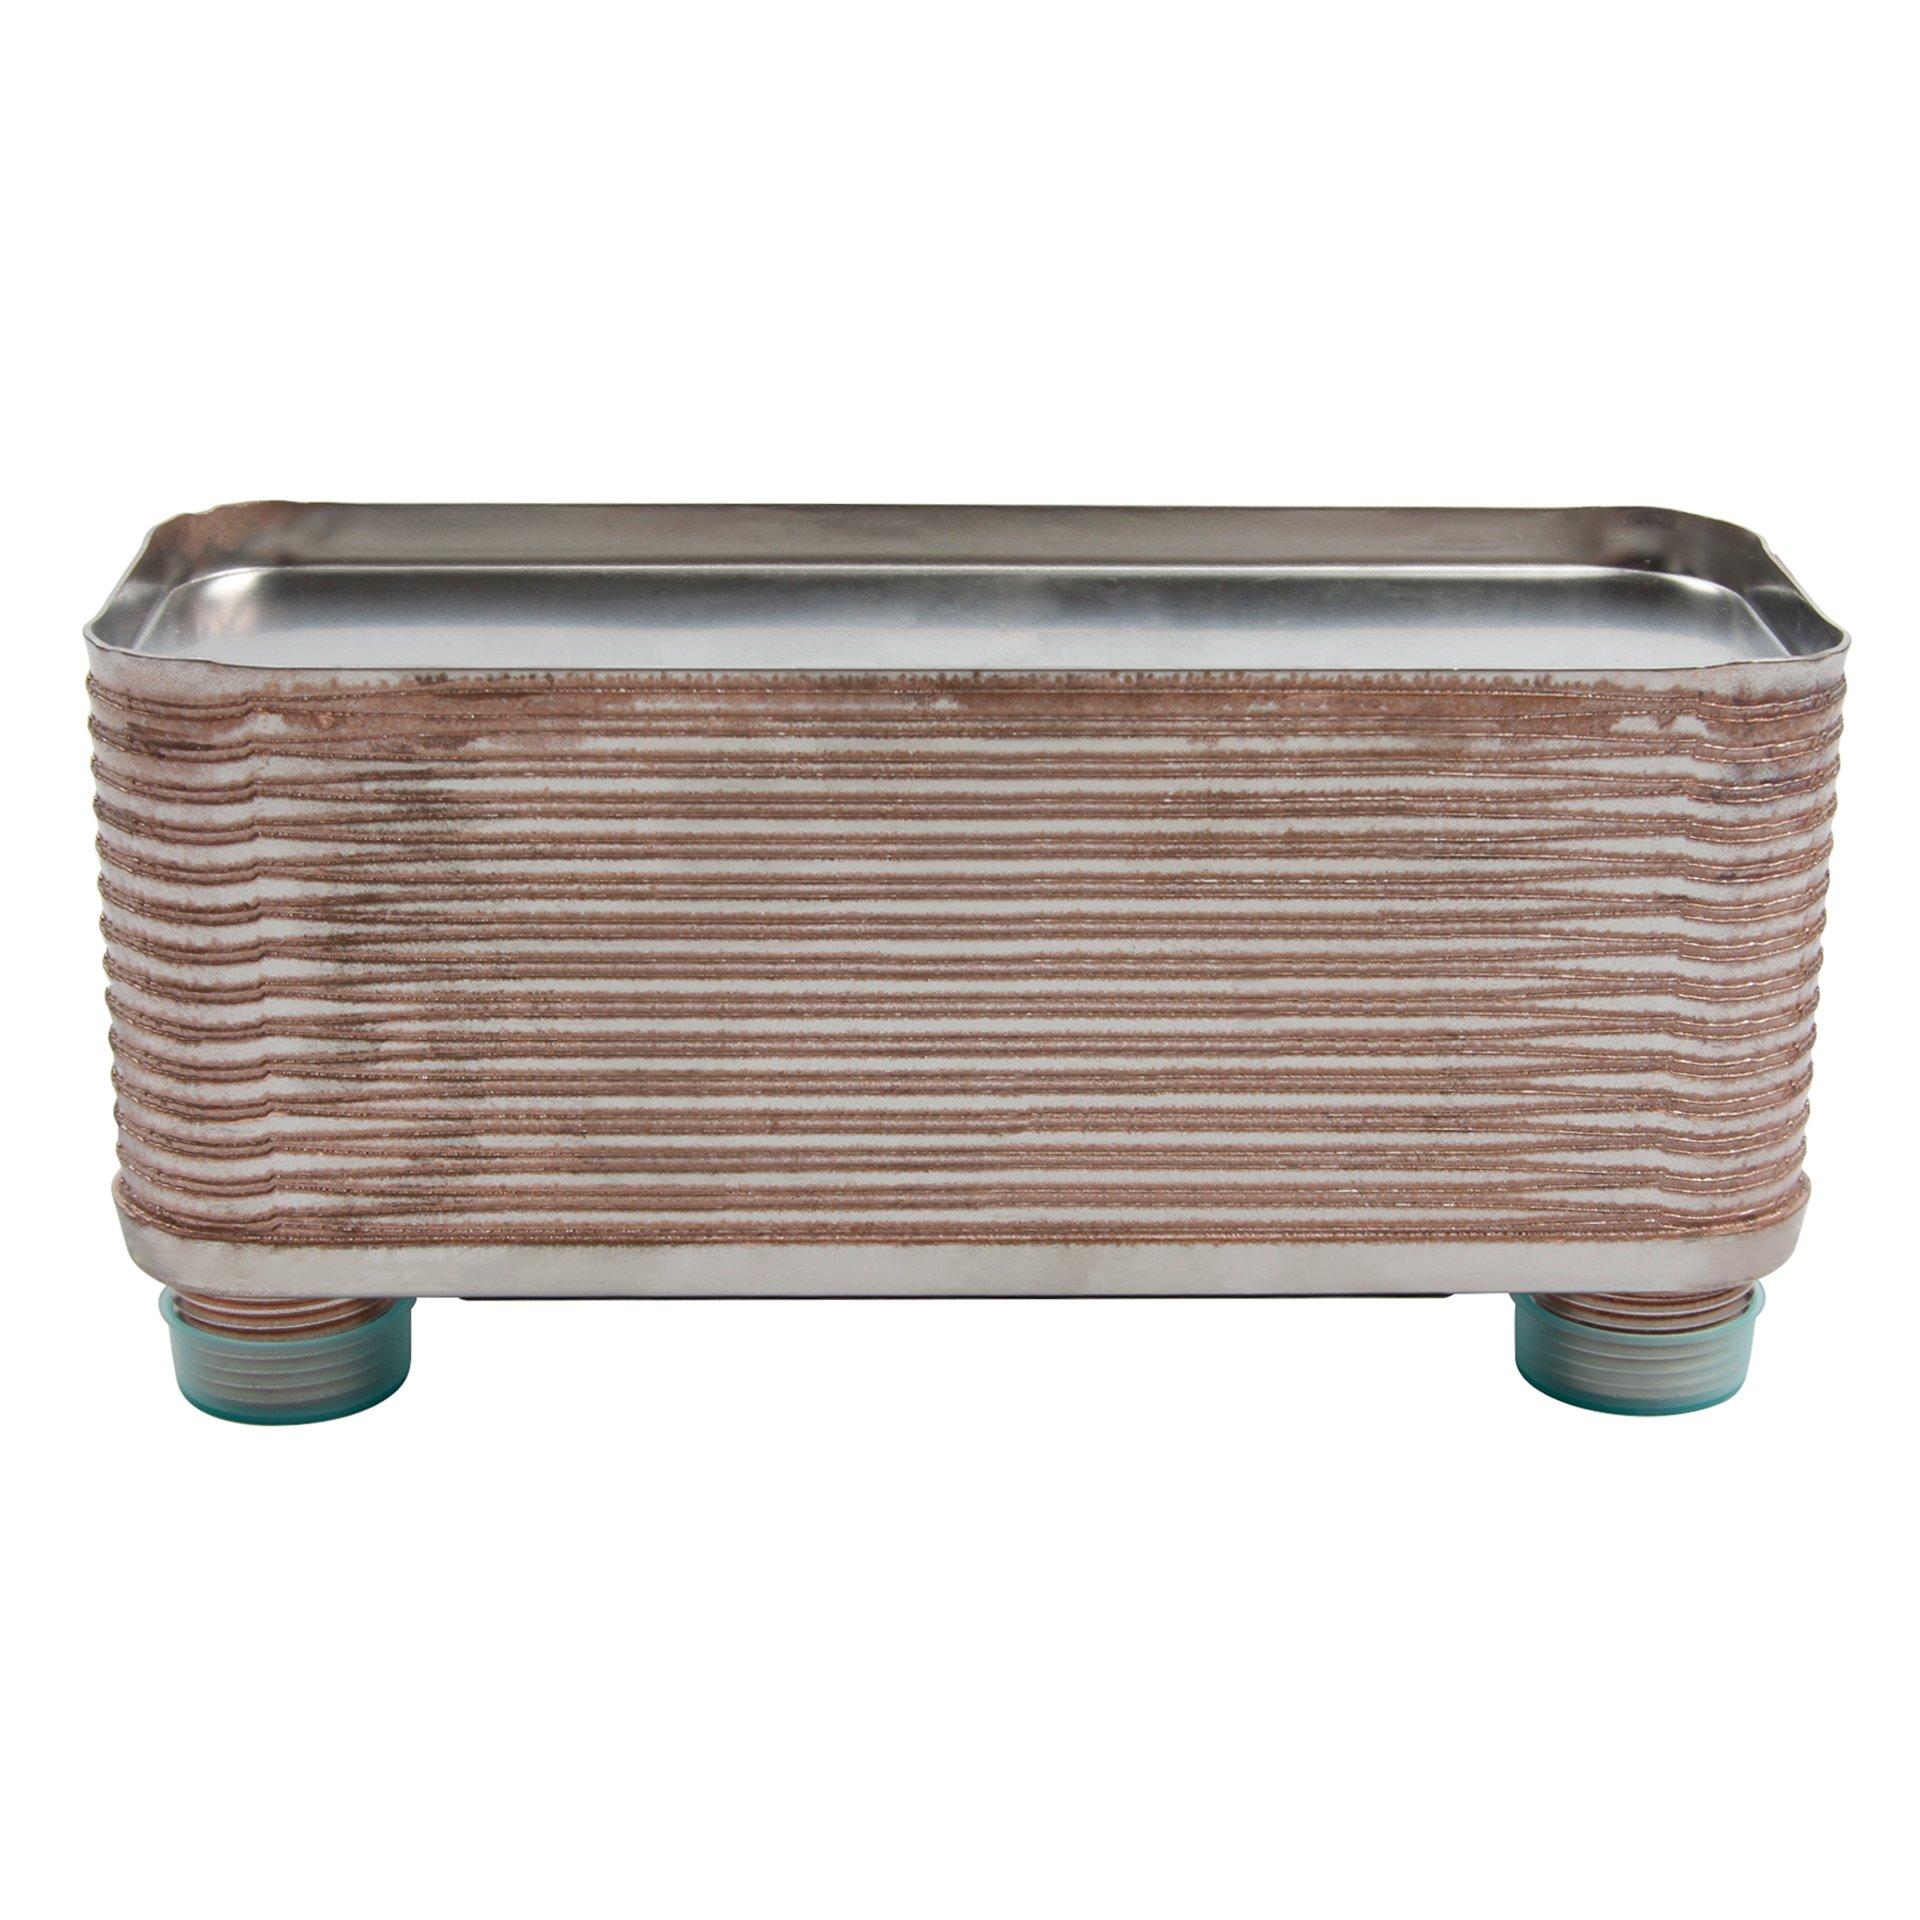 Fristaden Stainless Steel Brazed Plate Heat Exchanger - Plate Wort Chiller - Plate Chiller - B3-12A-30